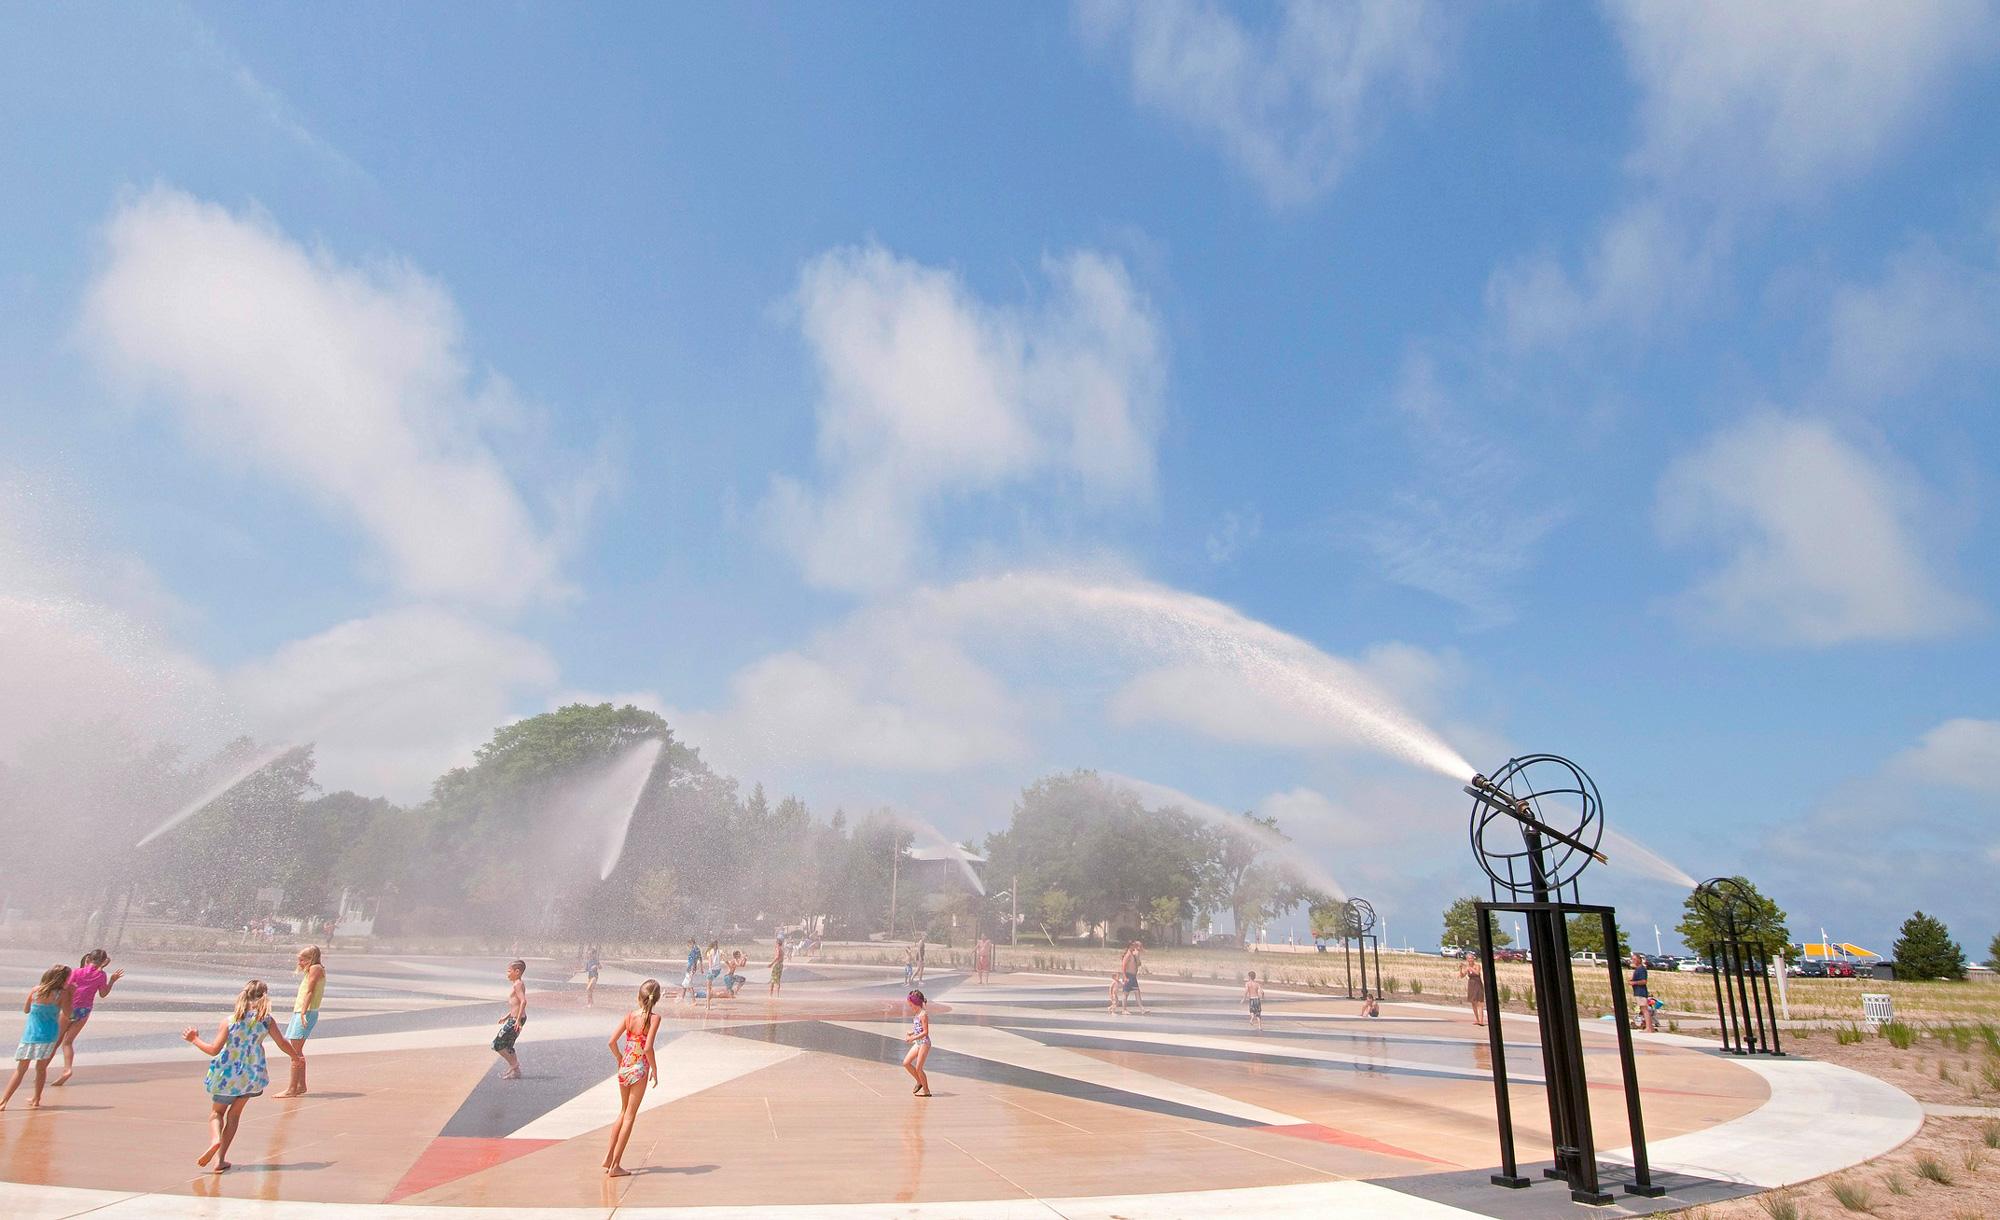 Silver Beach County Park